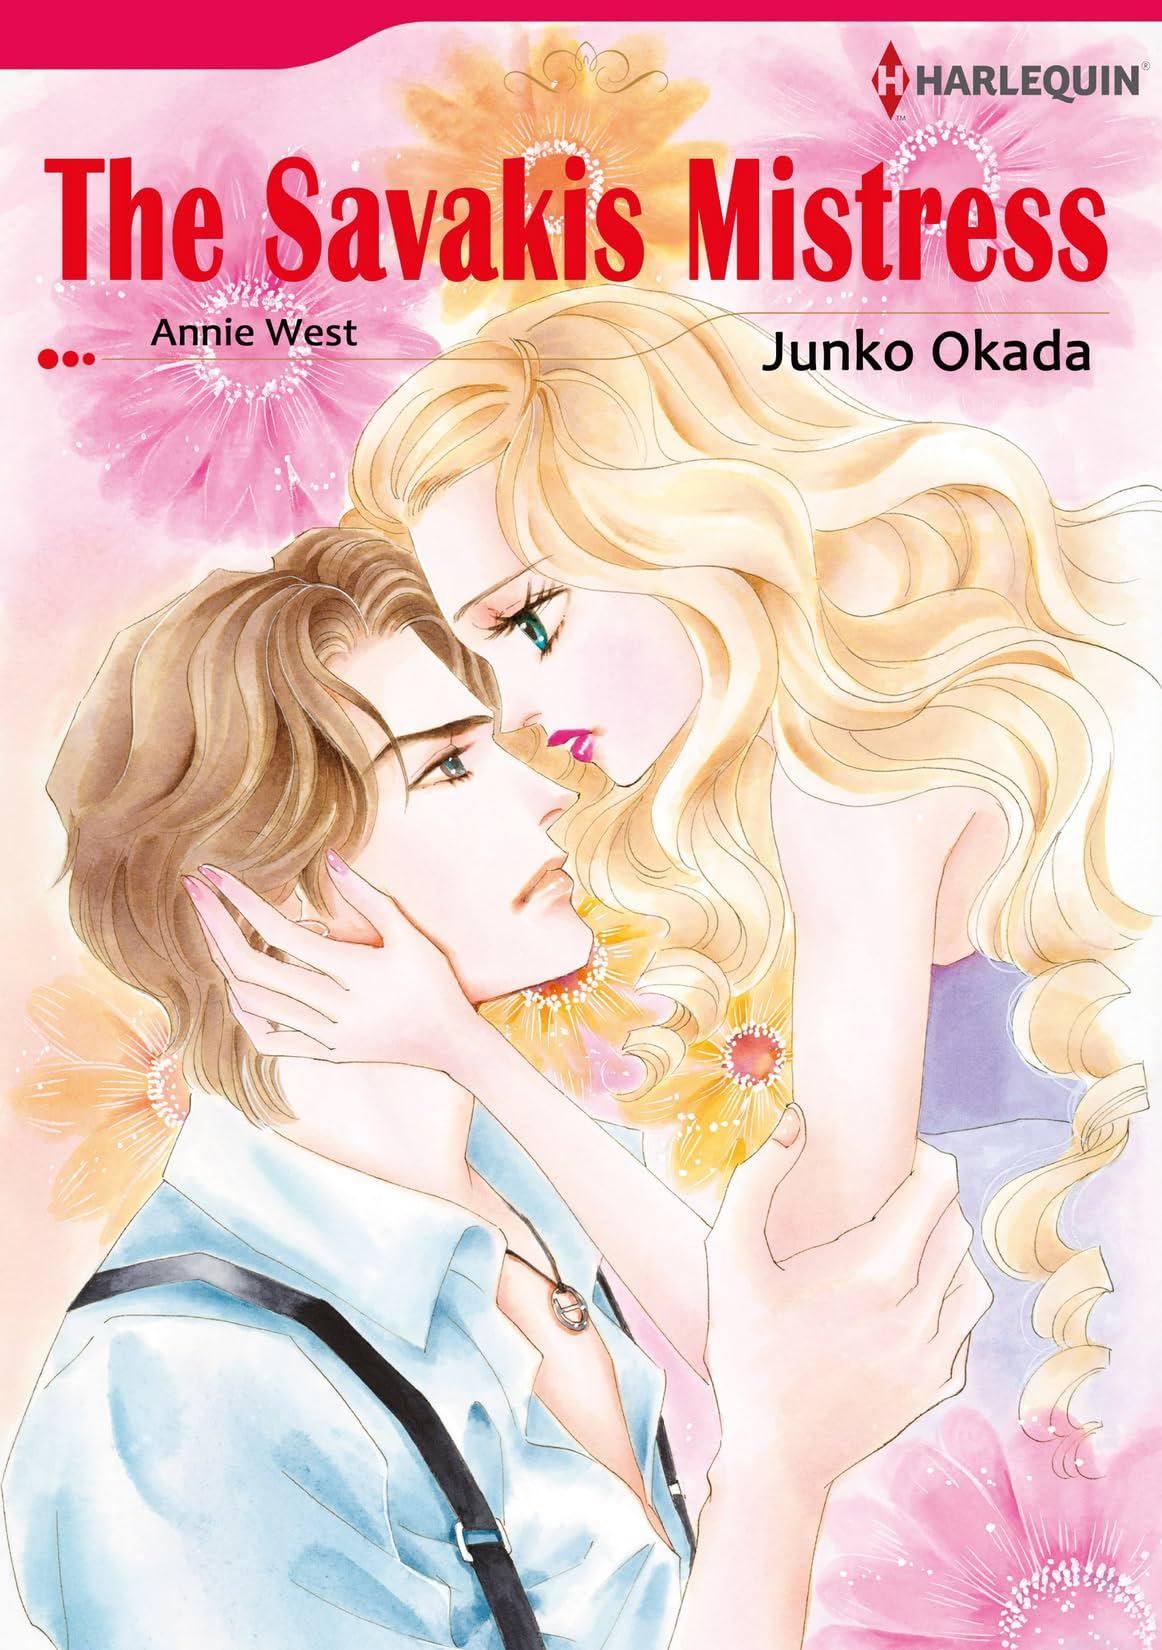 The Savakis Mistress